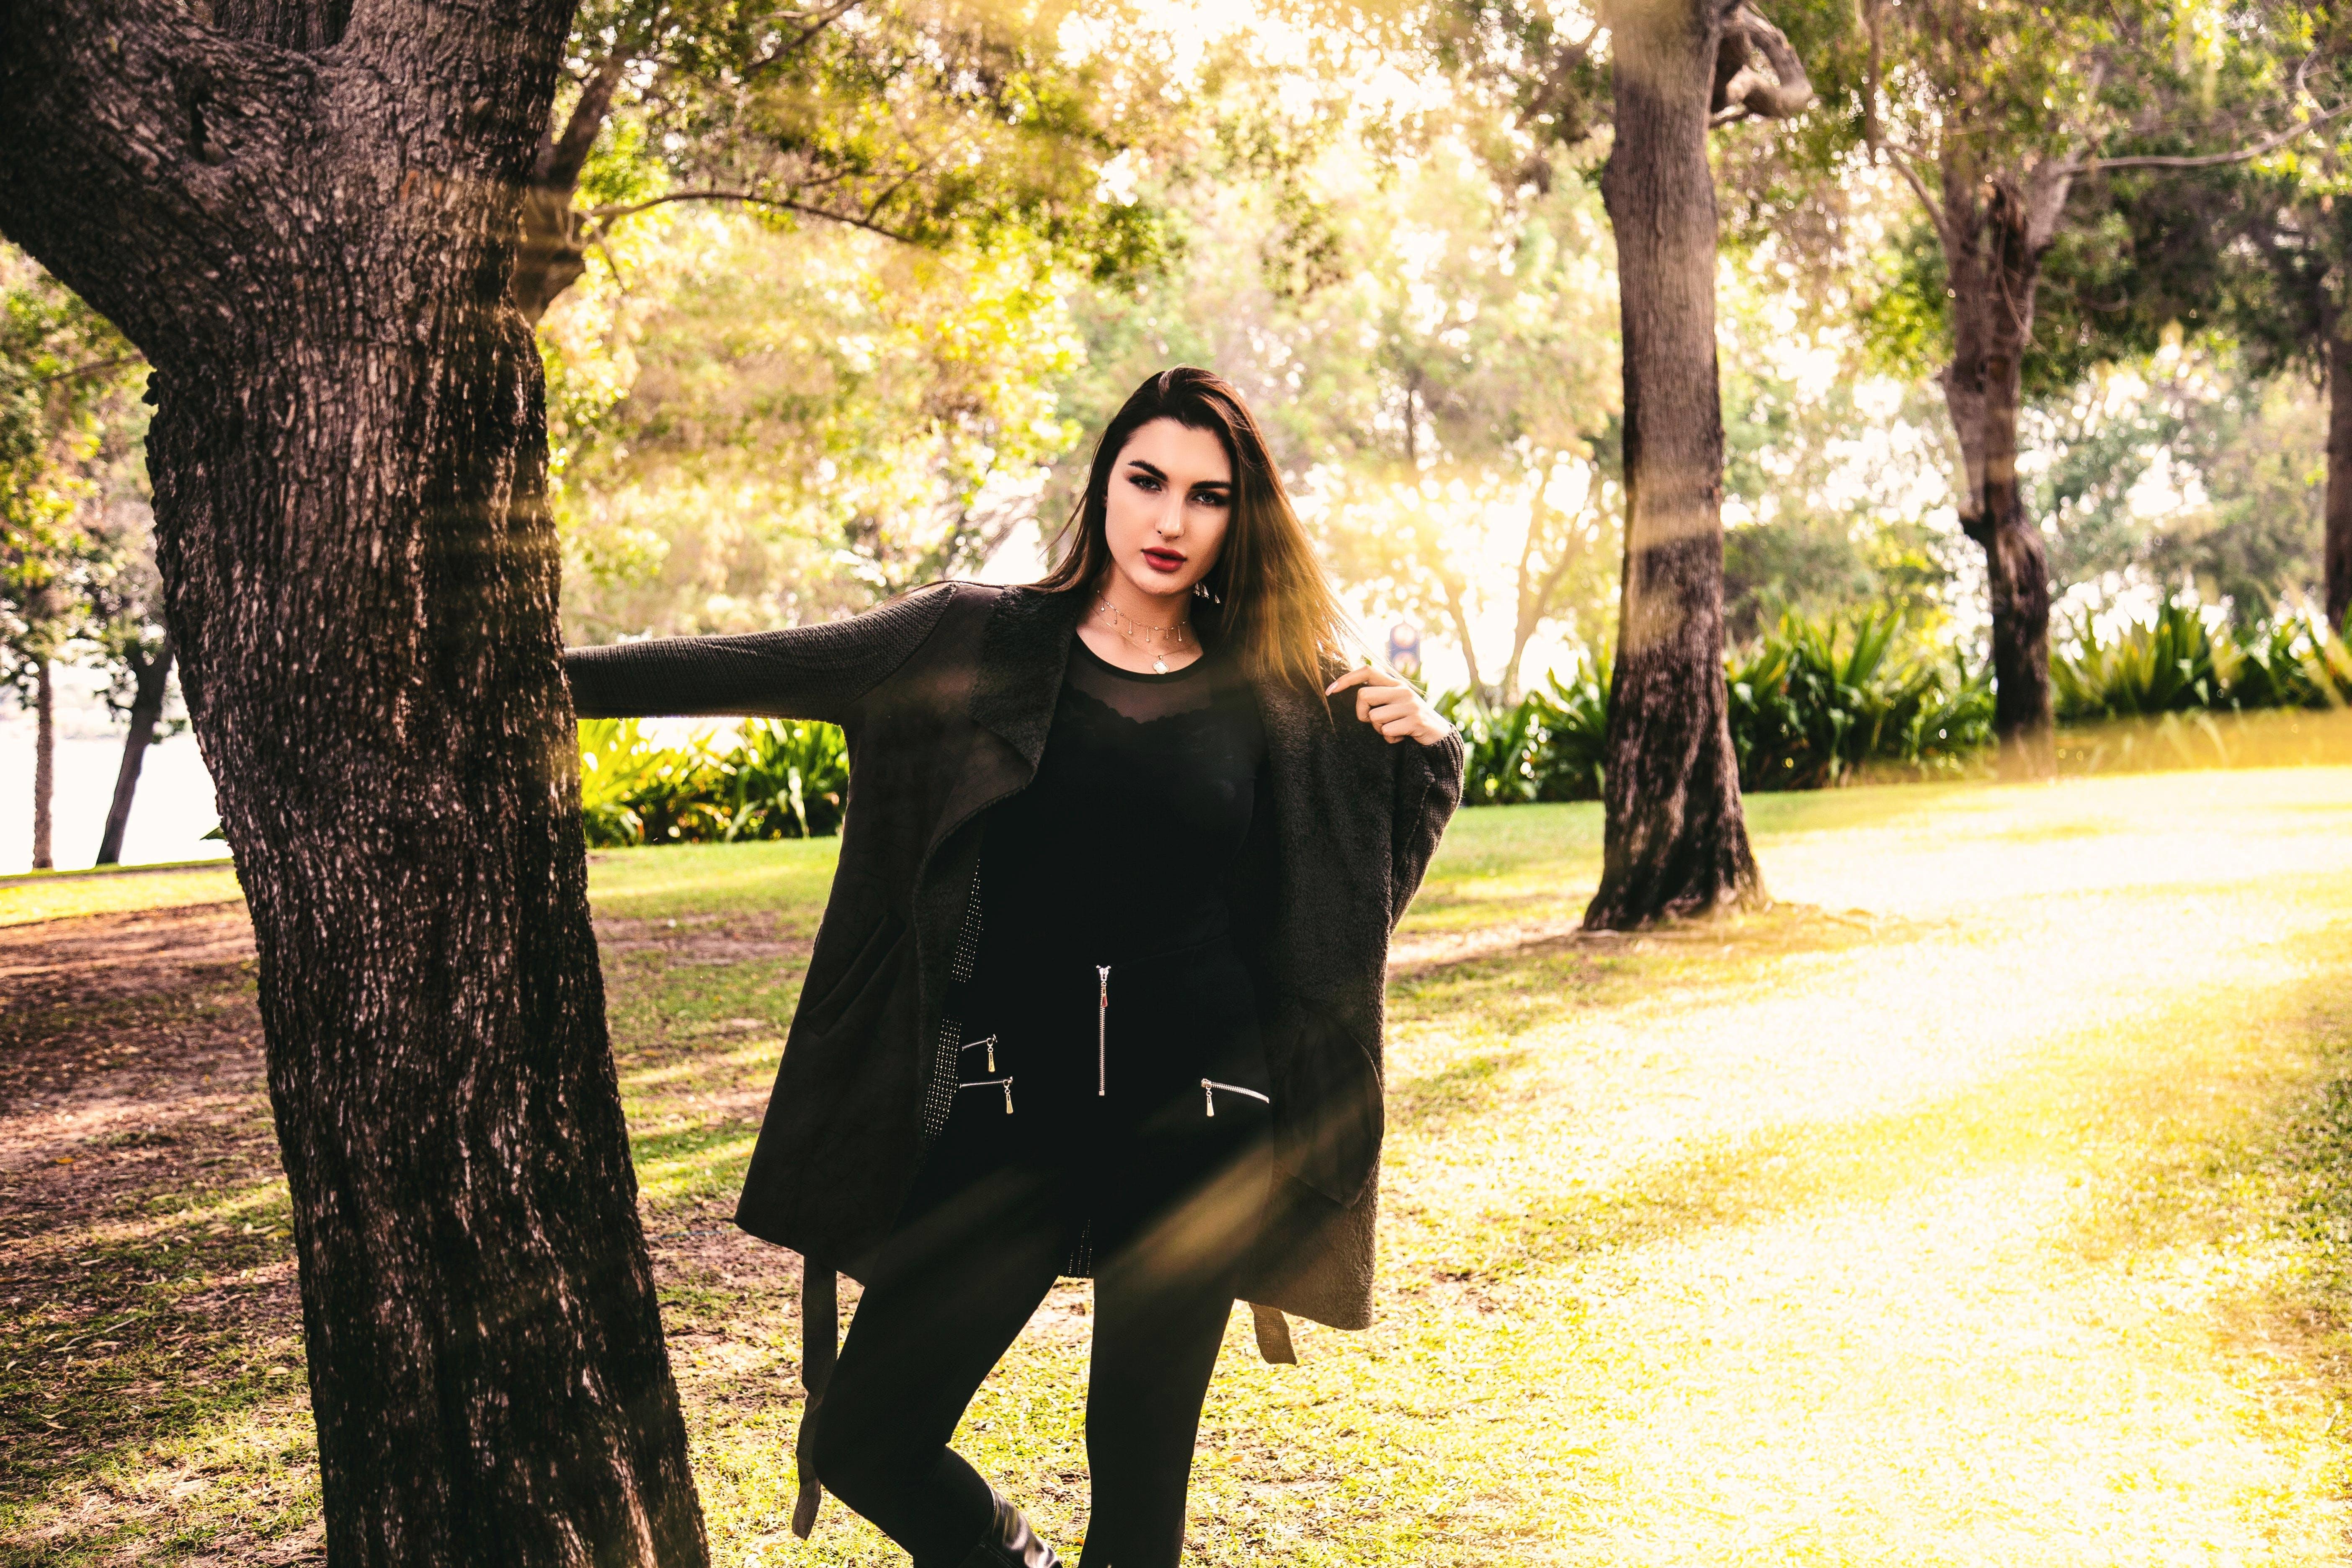 Kostenloses Stock Foto zu bäume, fashion, fotoshooting, frau